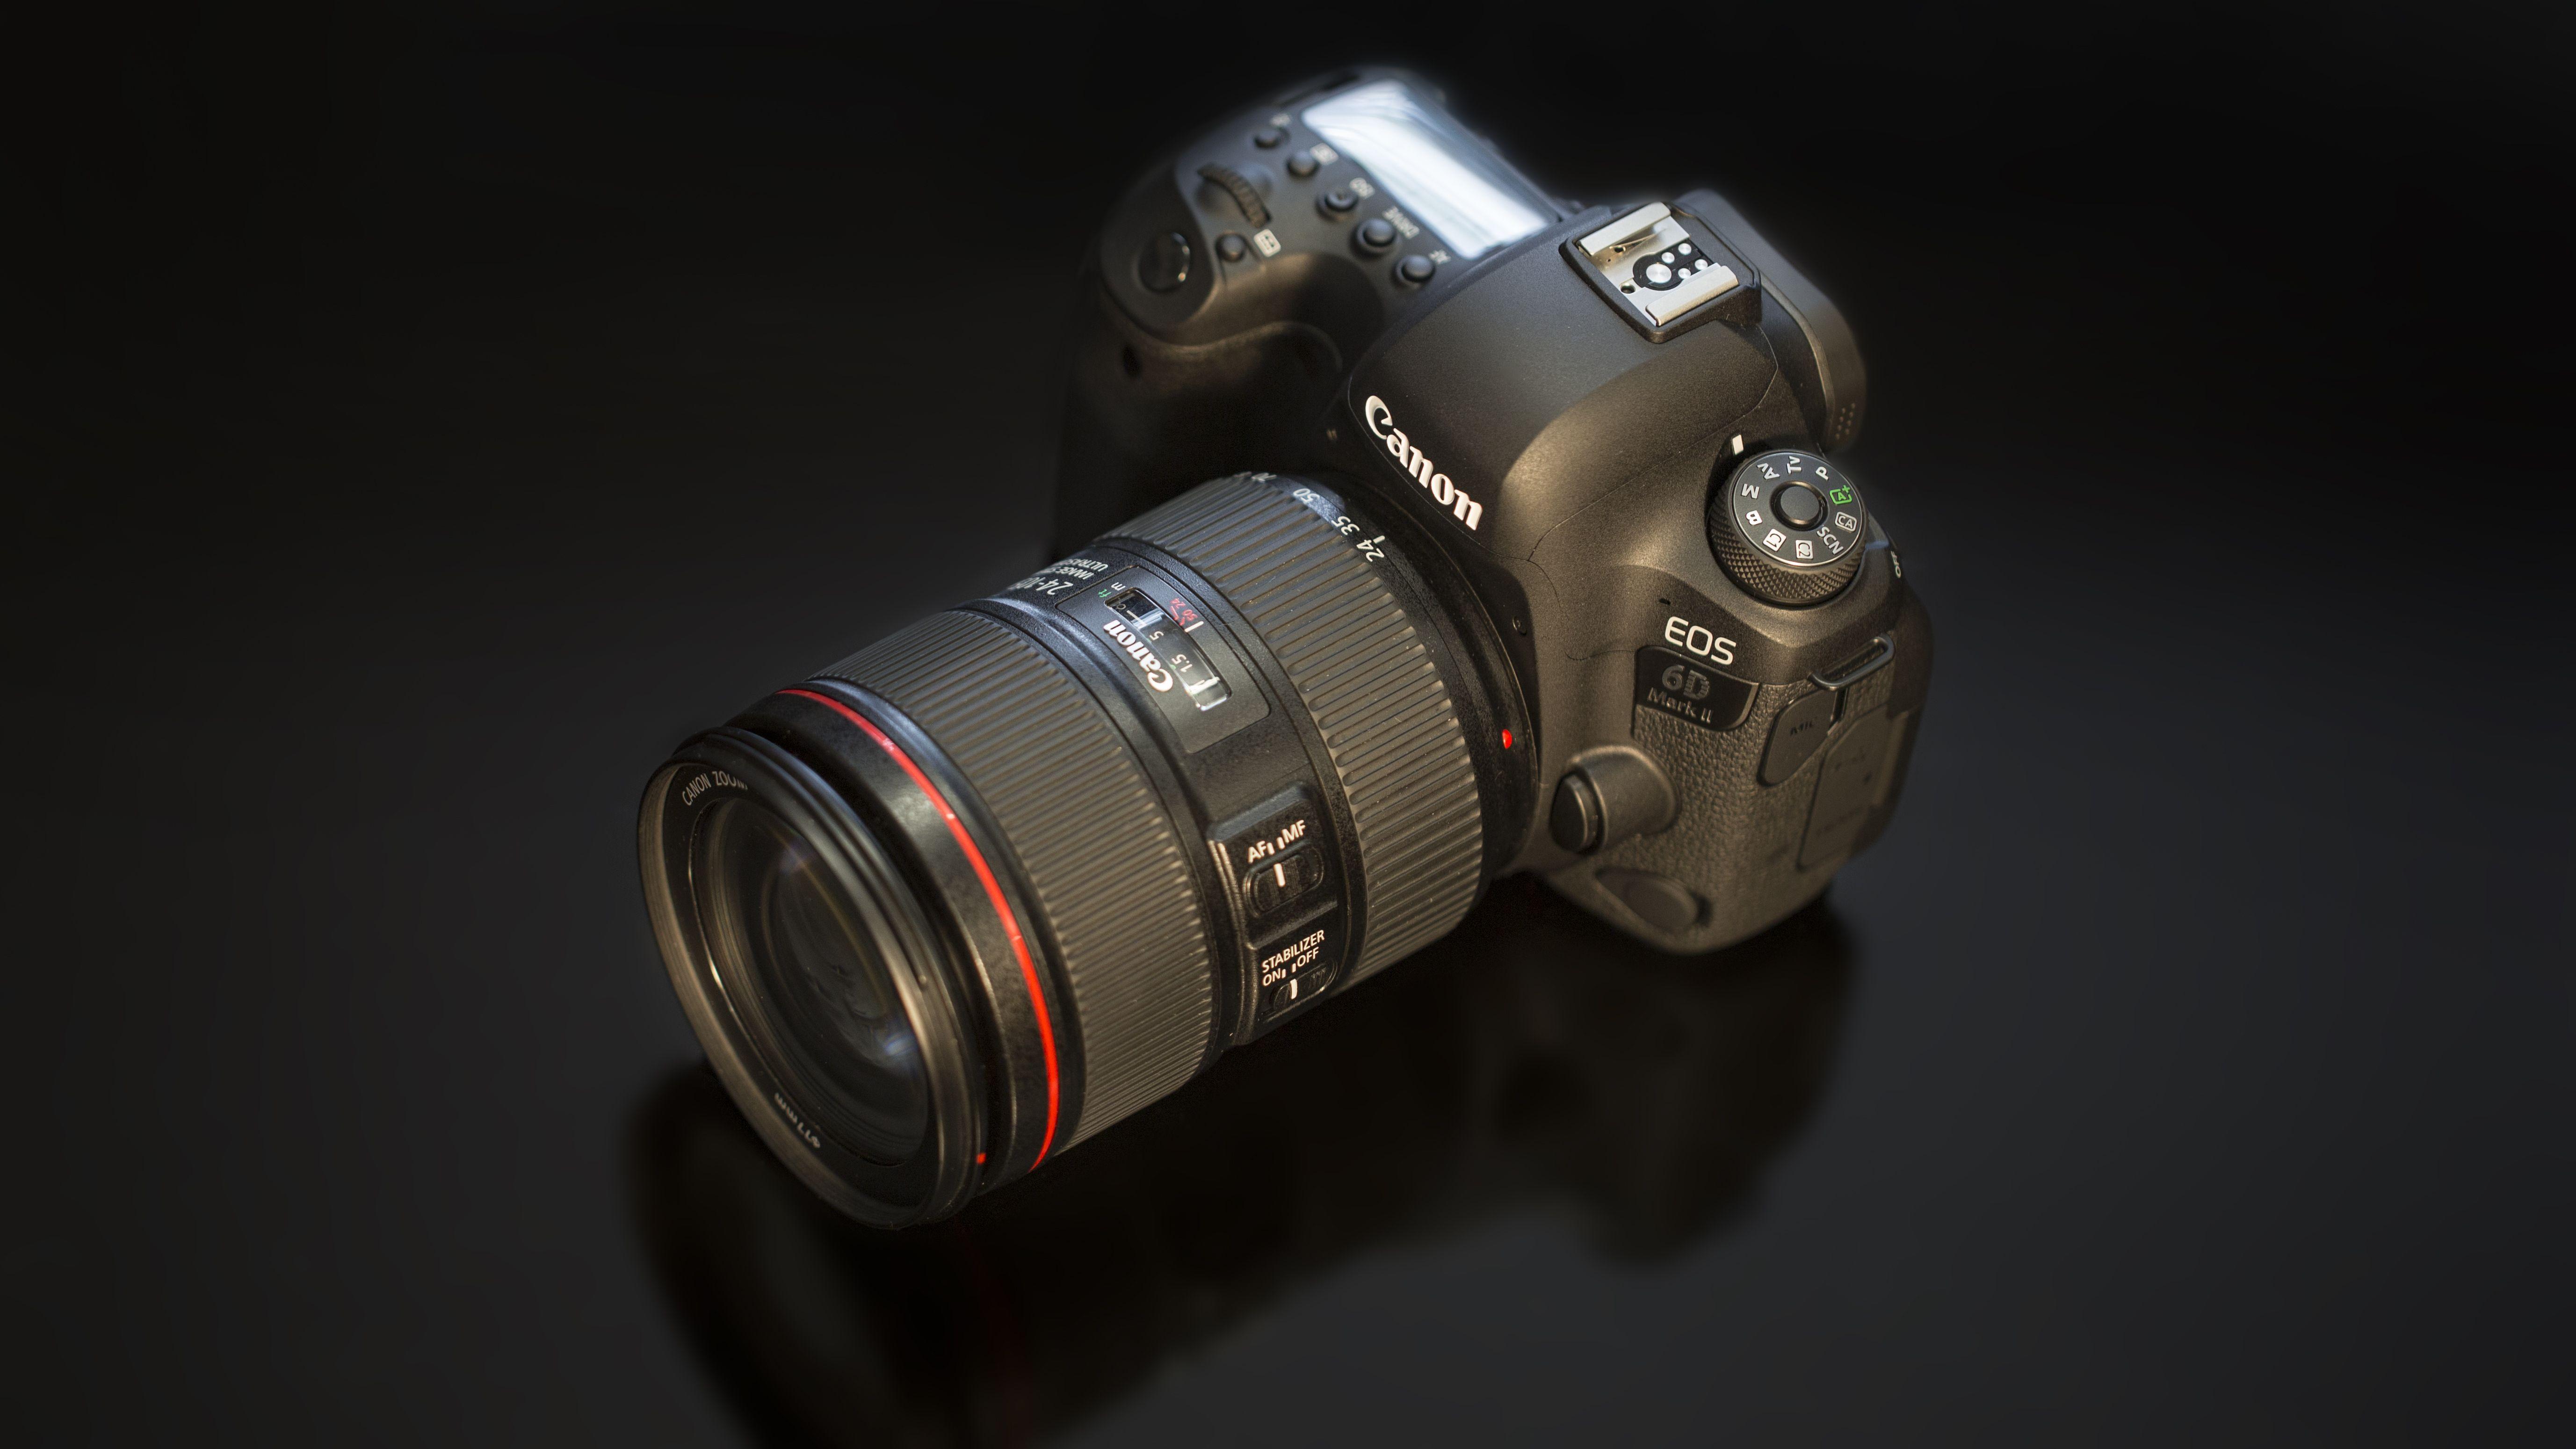 Canon Eos Ra Full Frame Mirrorless Camera For Astrophotography Mirrorless Camera Digital Camera Dslr Camera